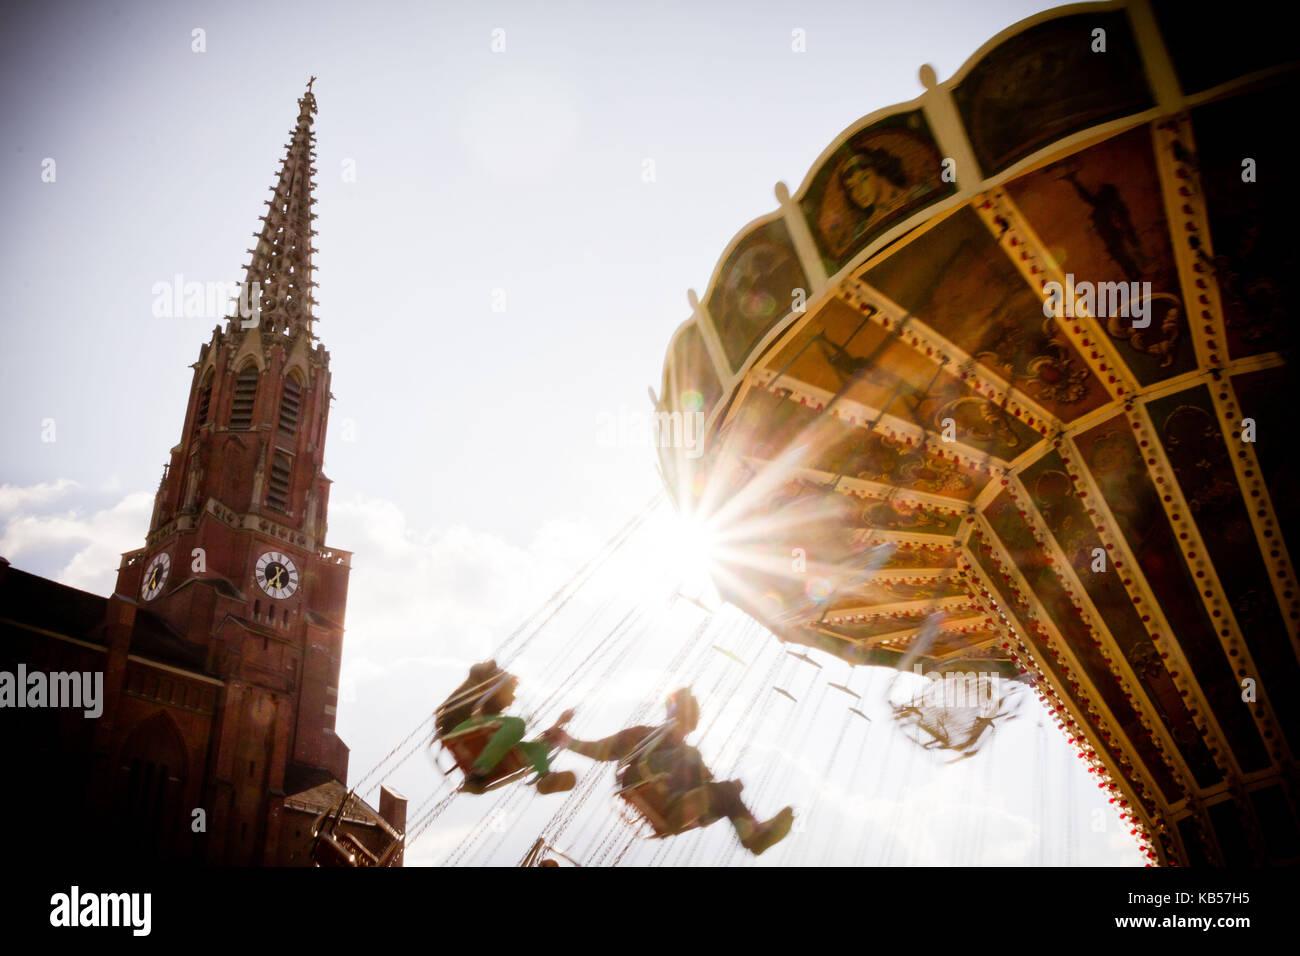 fun rides on the Auer Dult, Au, Munich, Bavaria, Germany - Stock Image